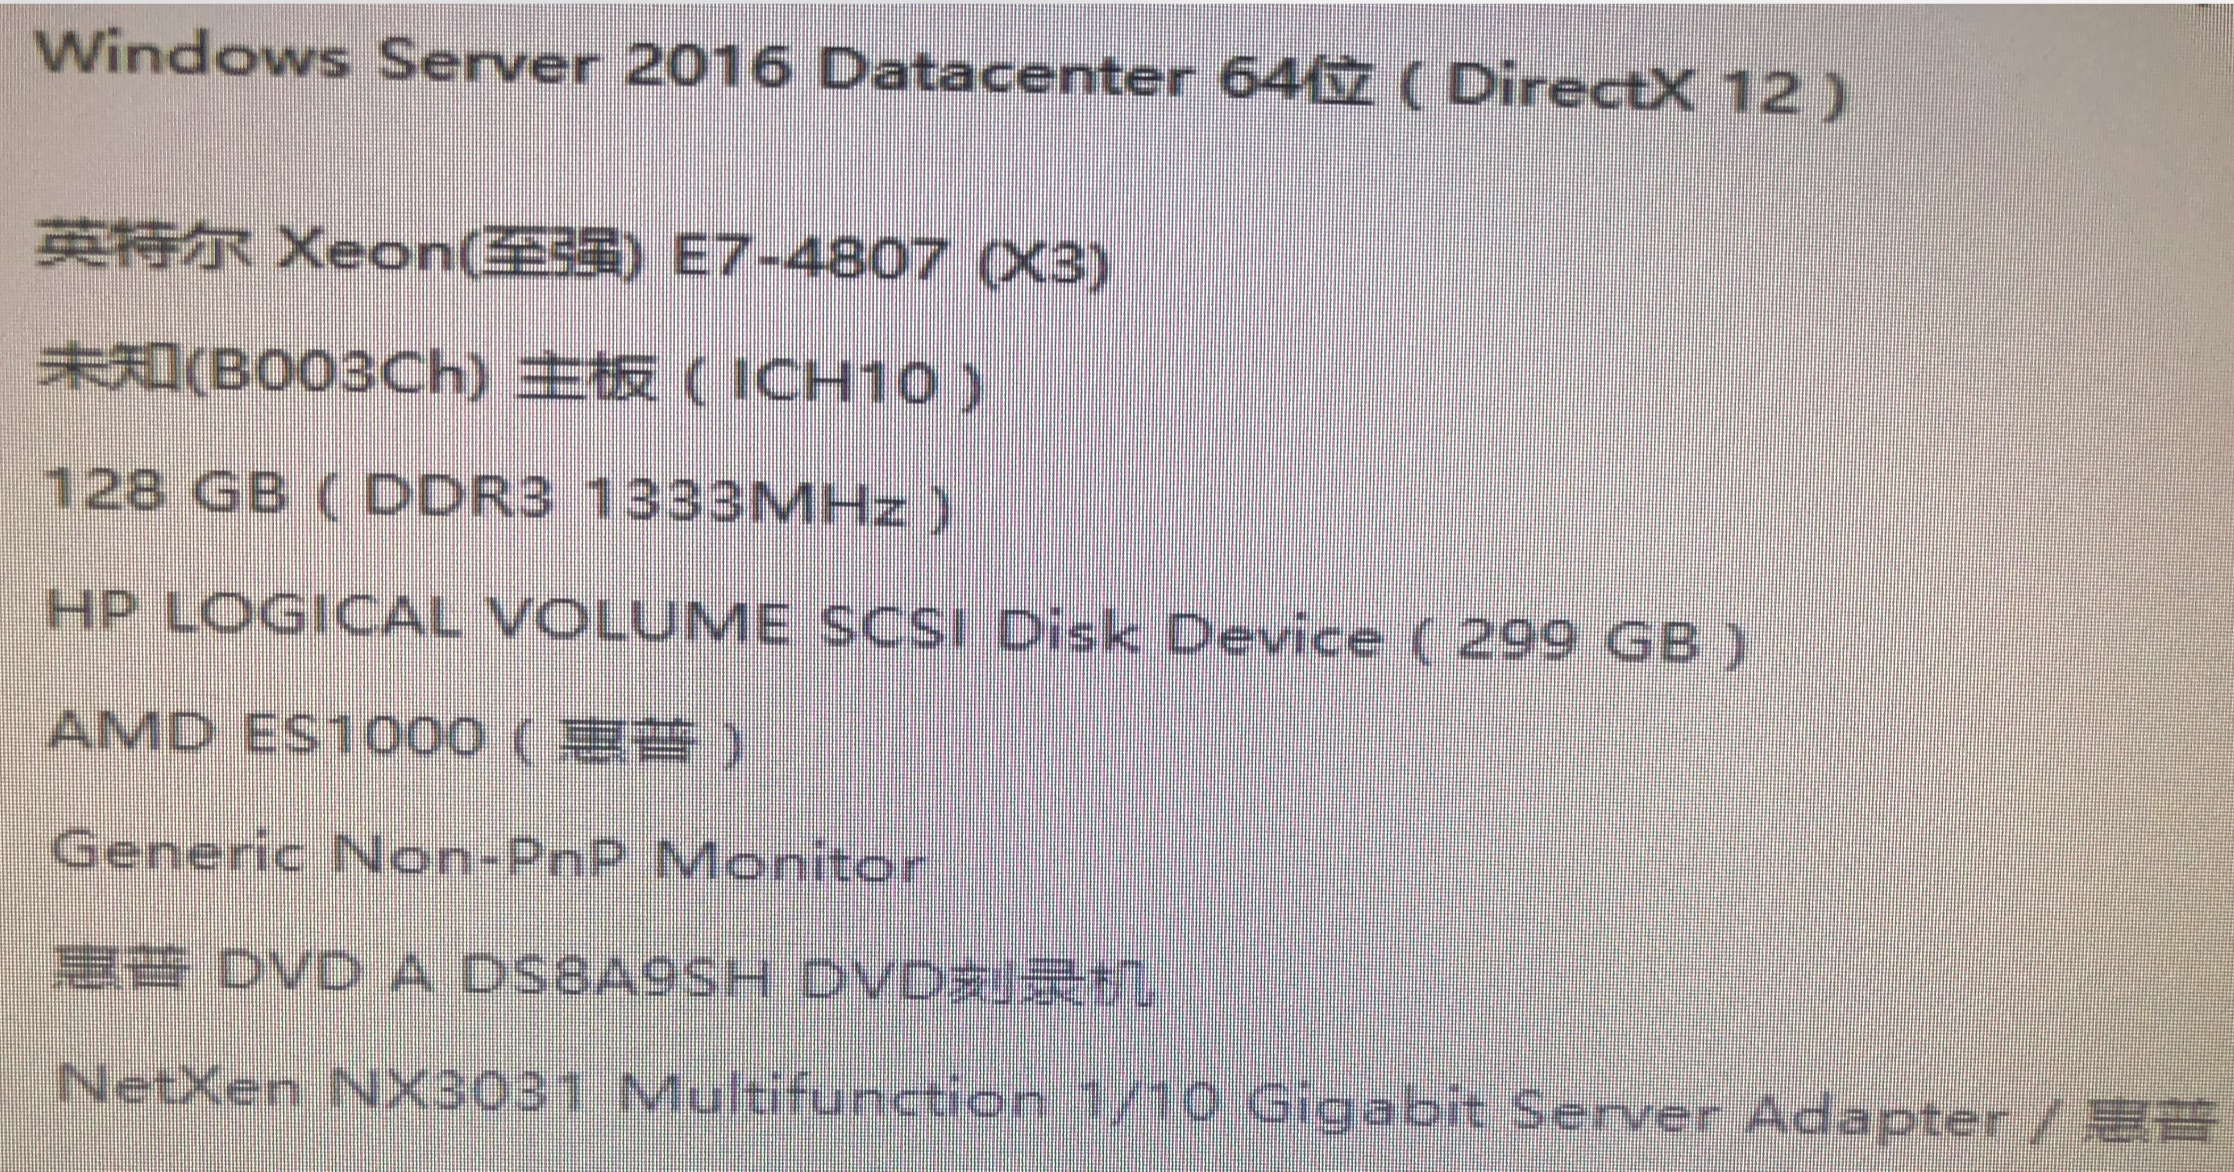 Xnip2019-08-02_19-52-21.jpg